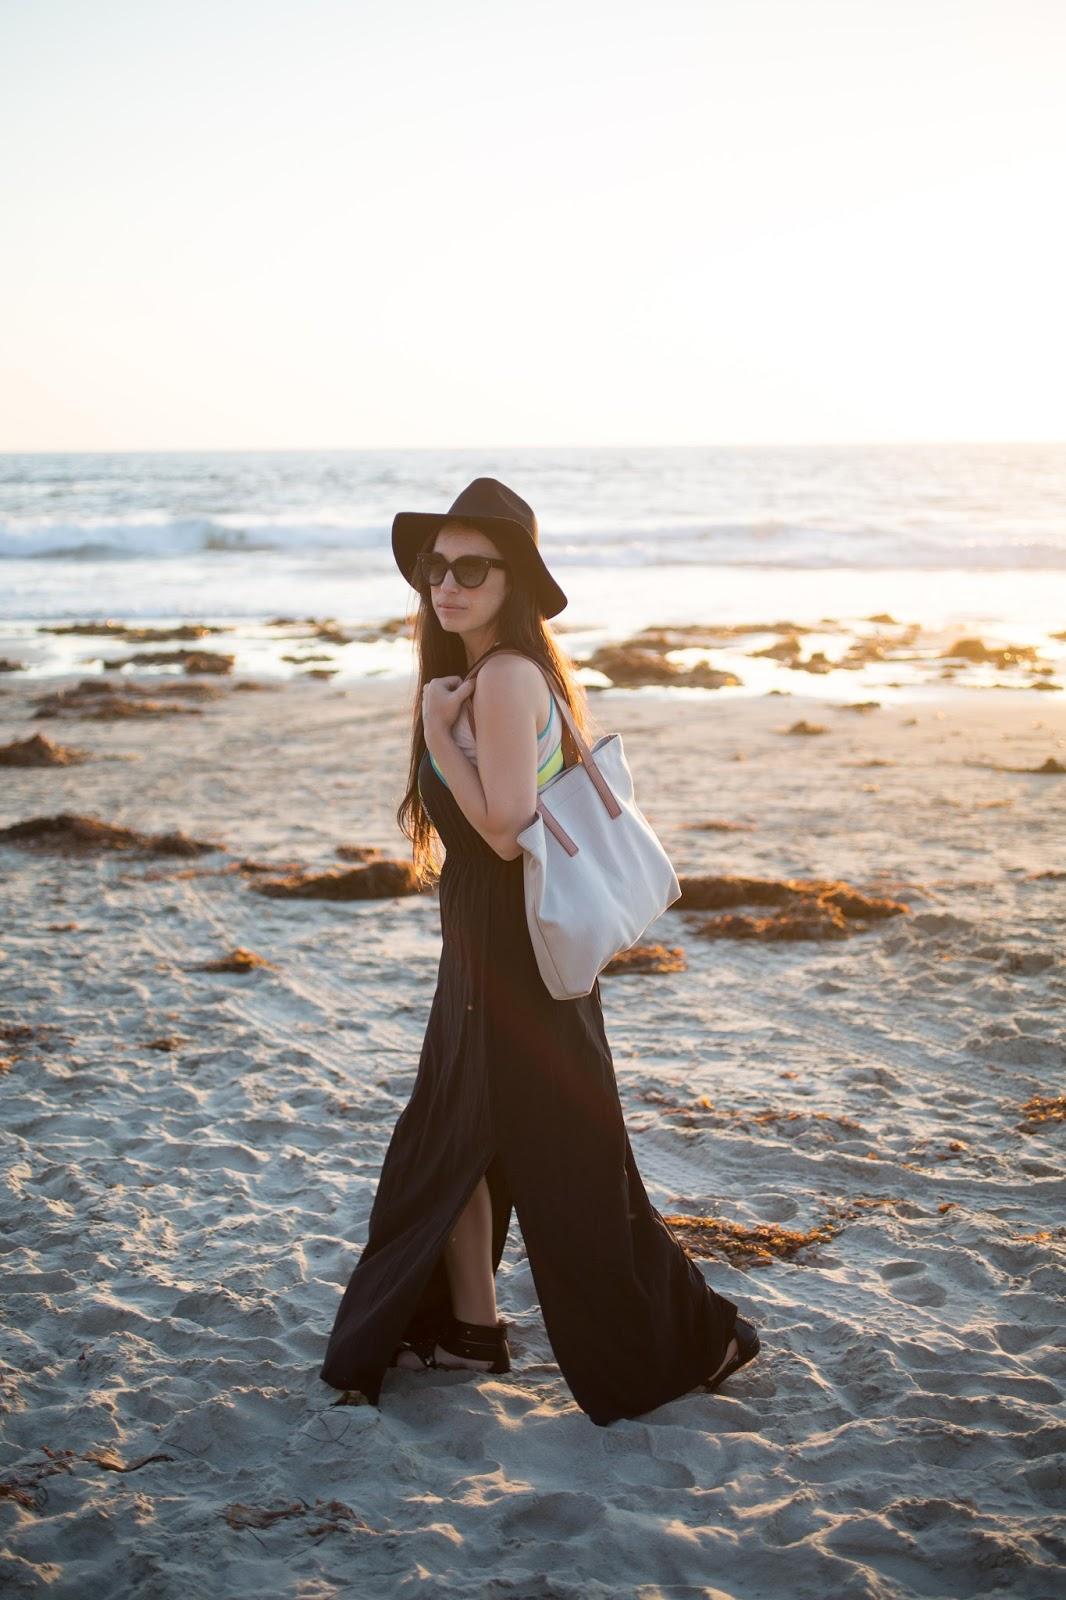 sundress at the beach